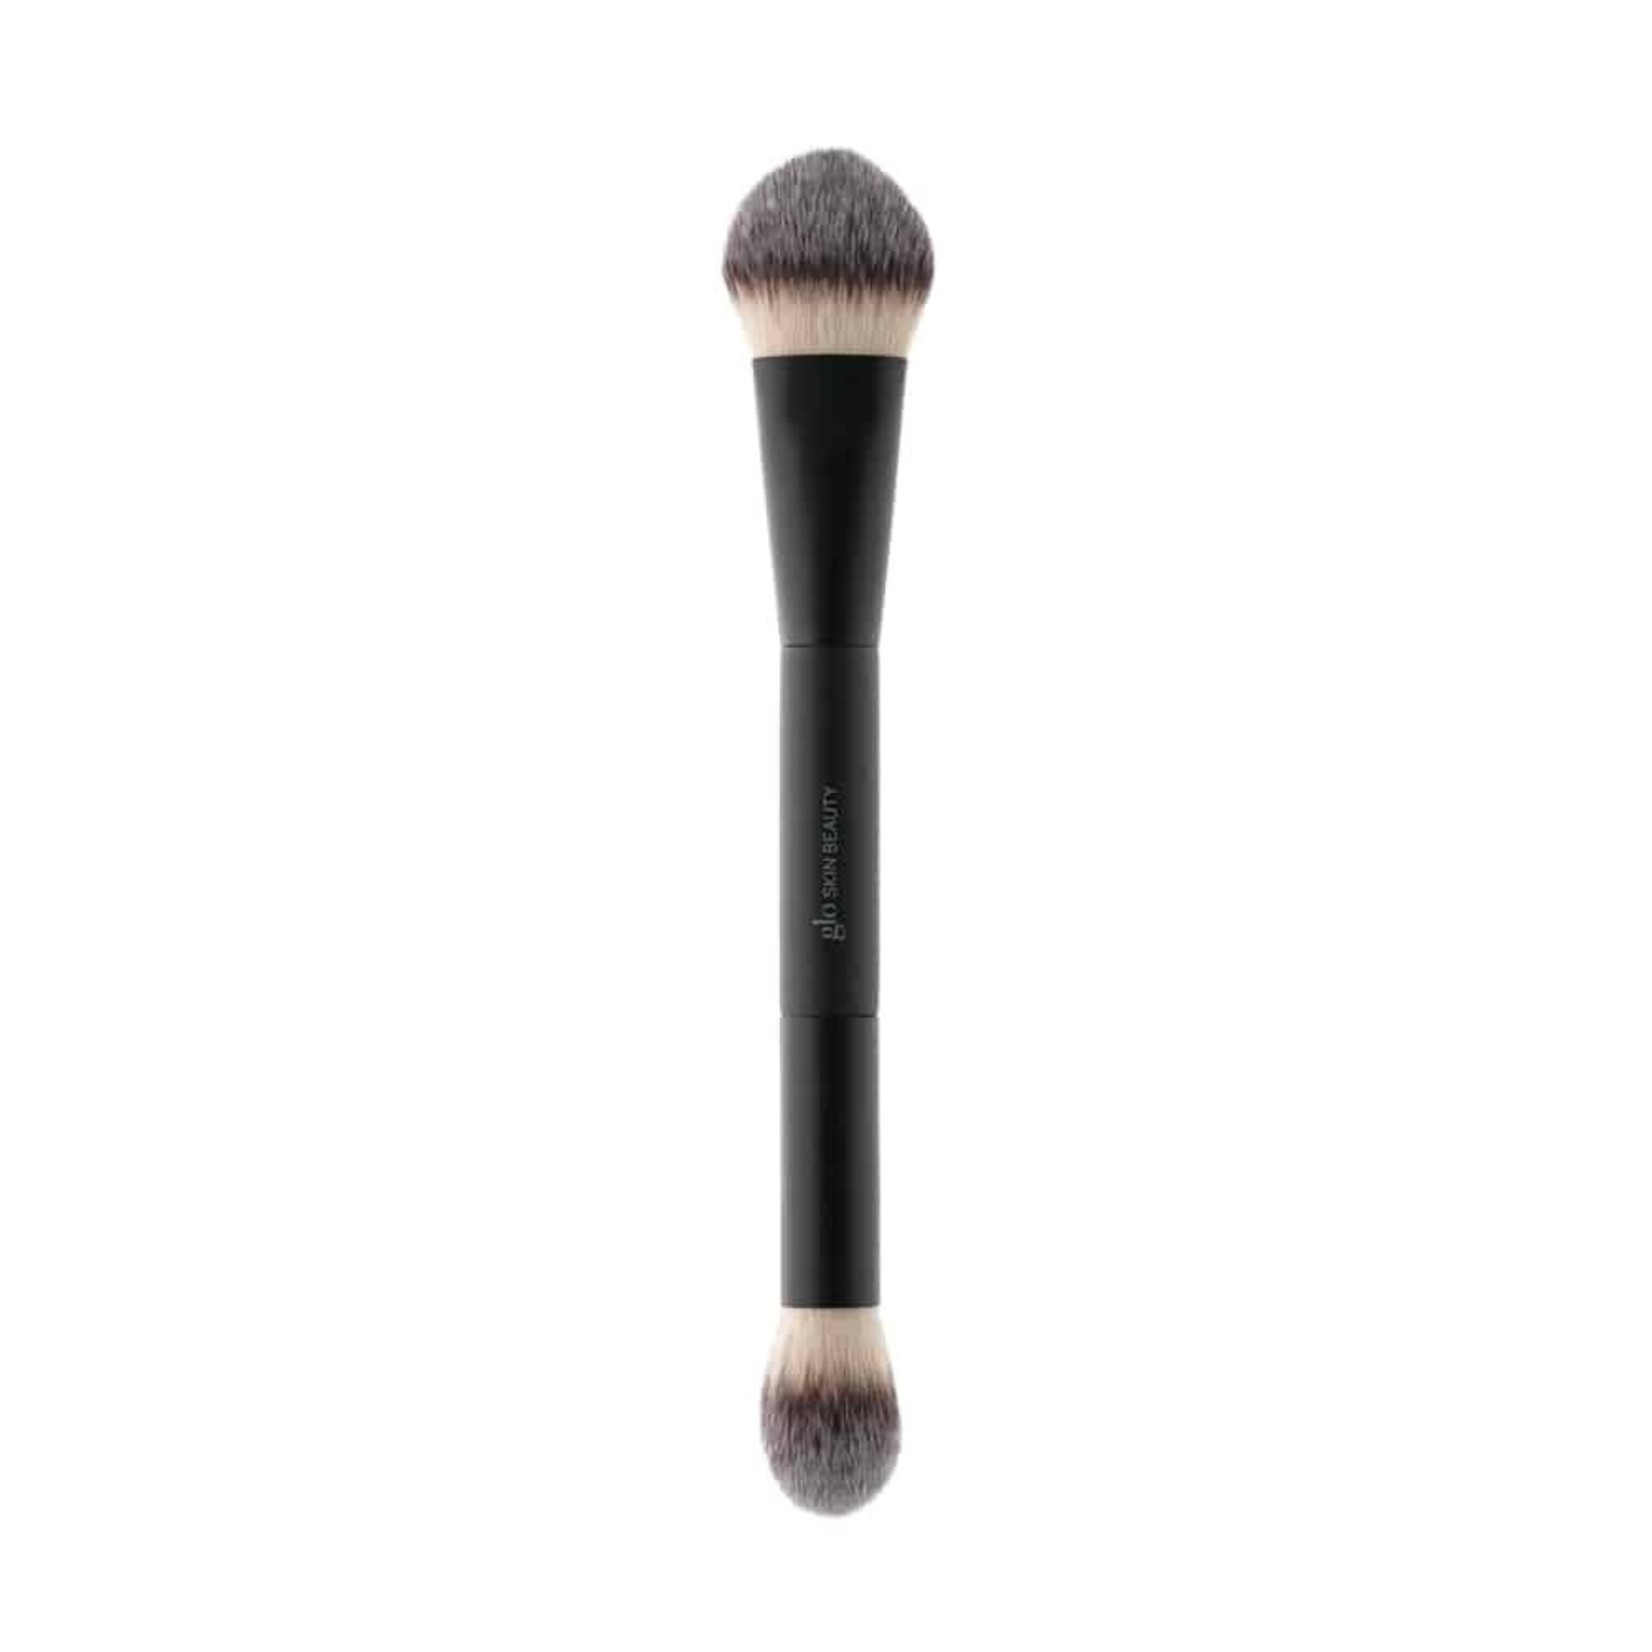 Glo Skin Beauty 107 Contour/Highlighter